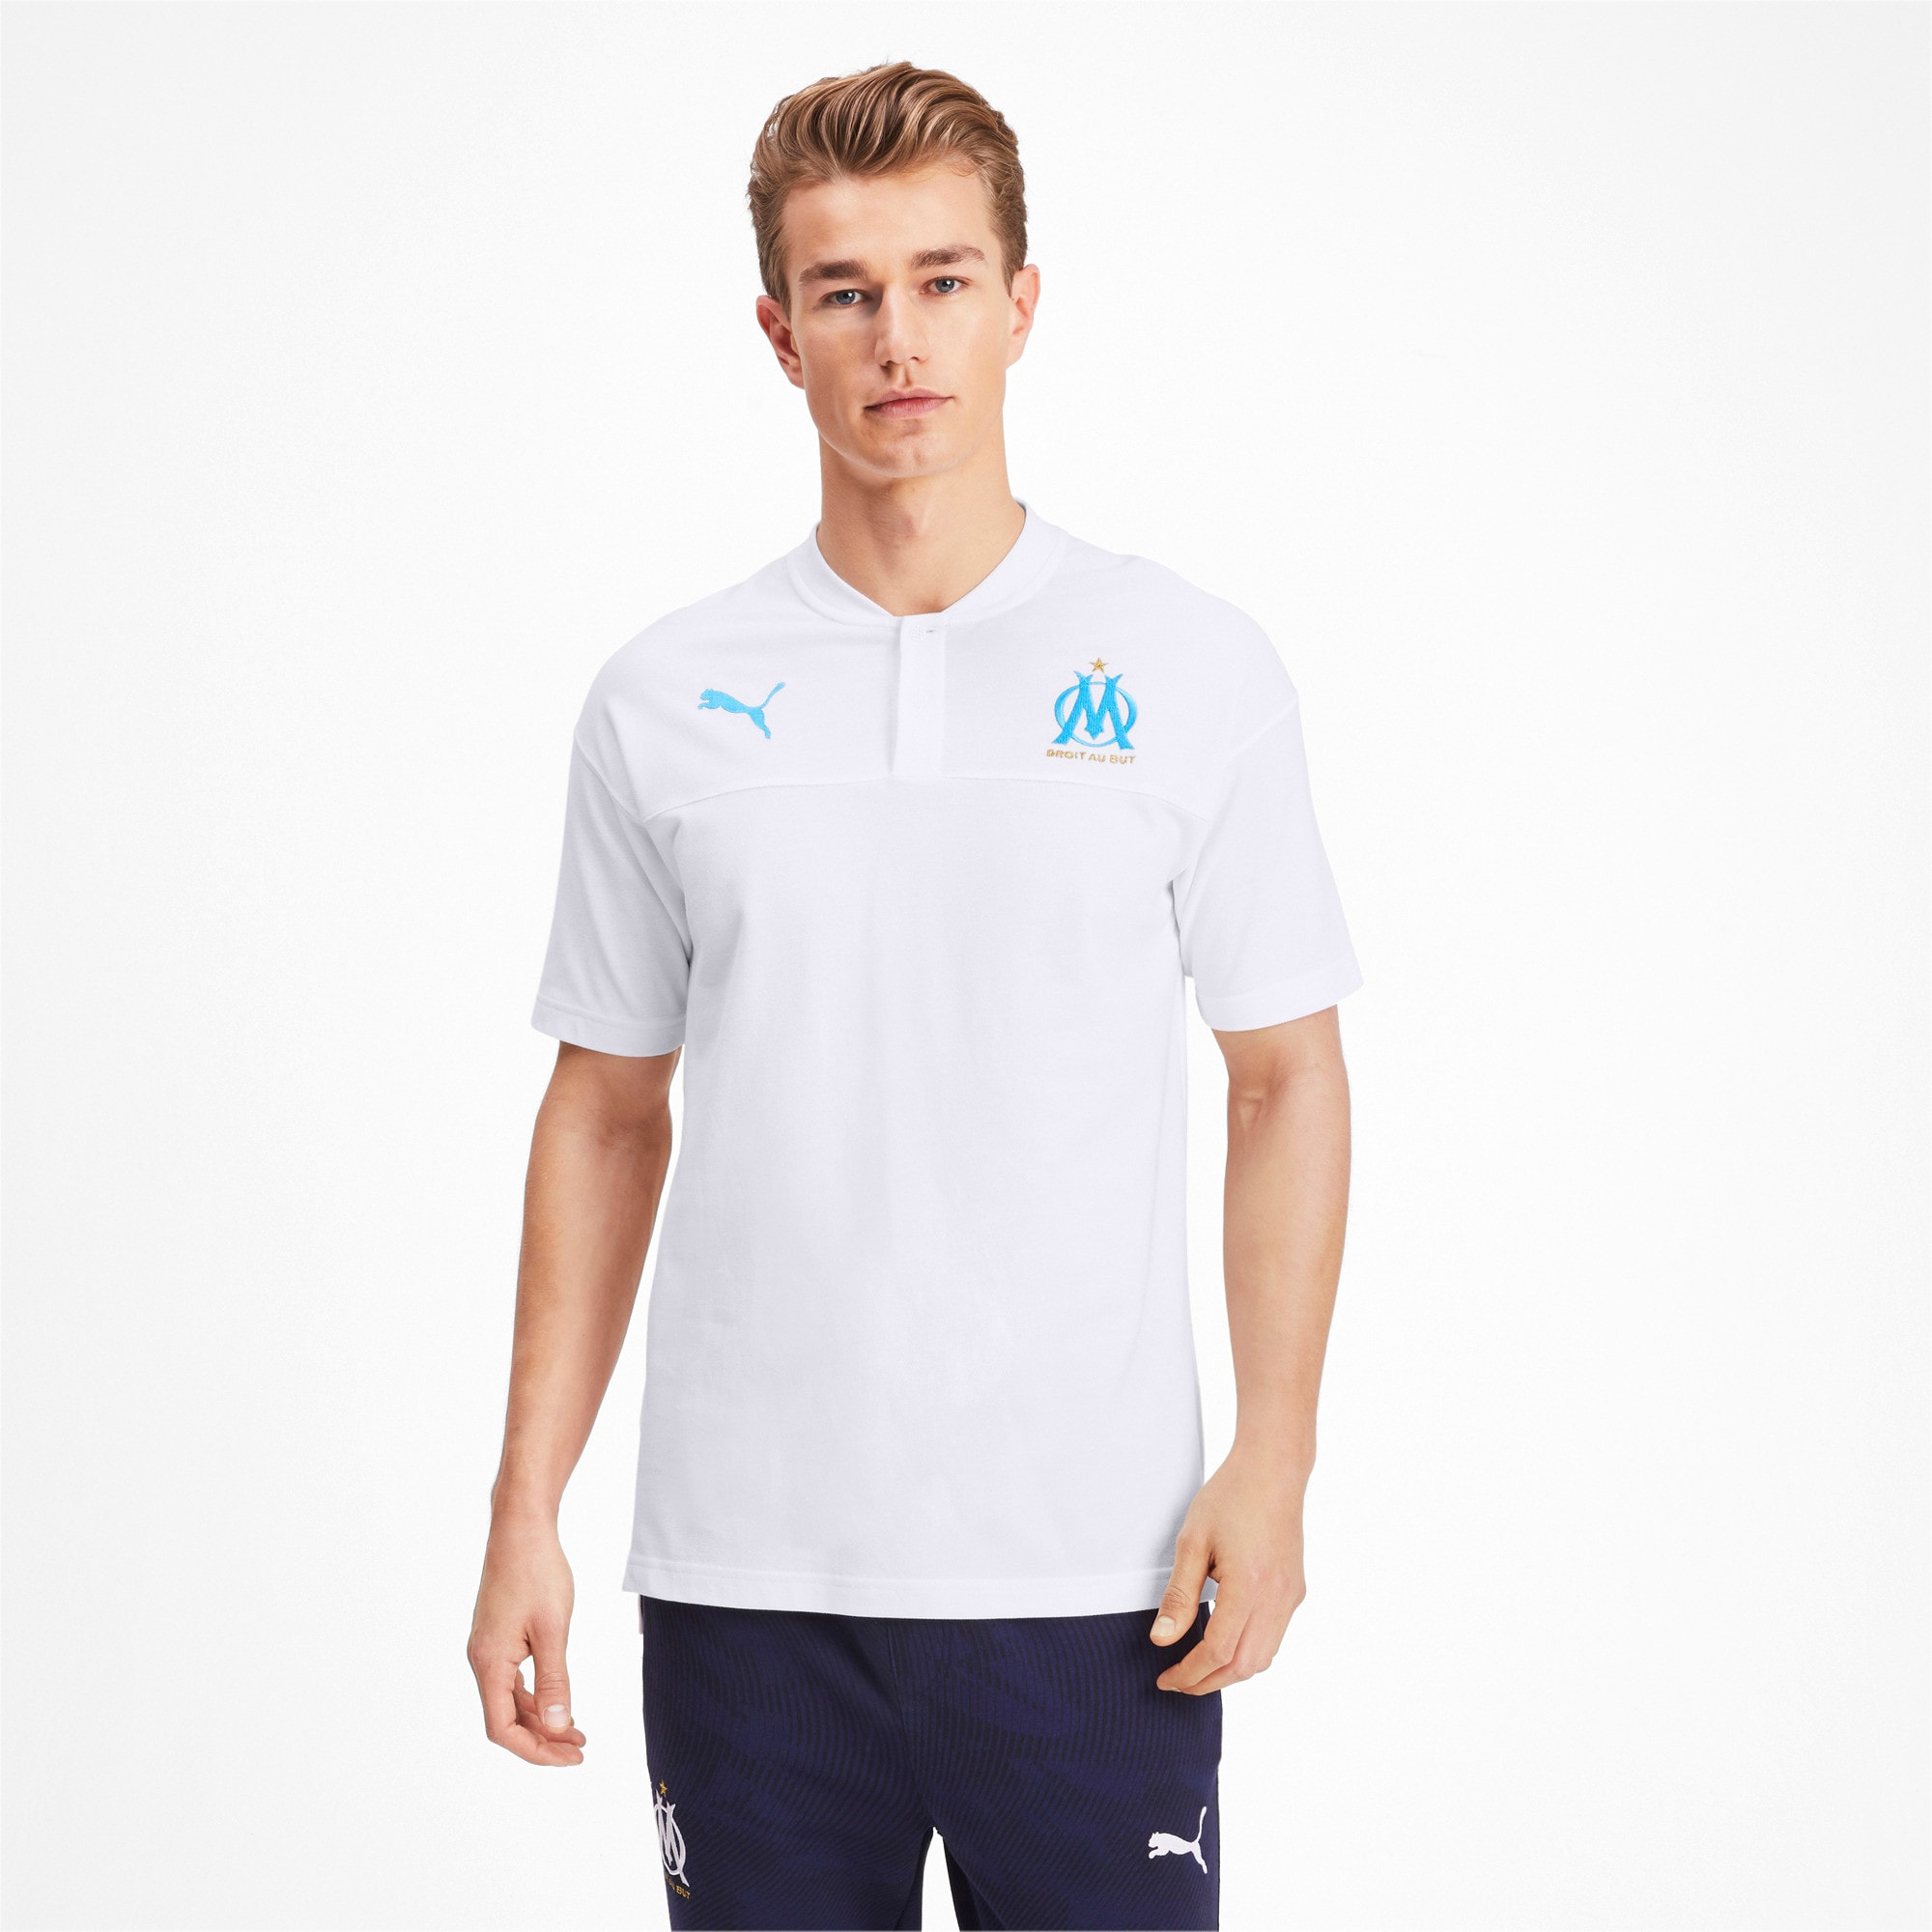 Thumbnail 1 of Olympique de Marseille Casuals Men's Polo Shirt, Puma White-Bleu Azur, medium